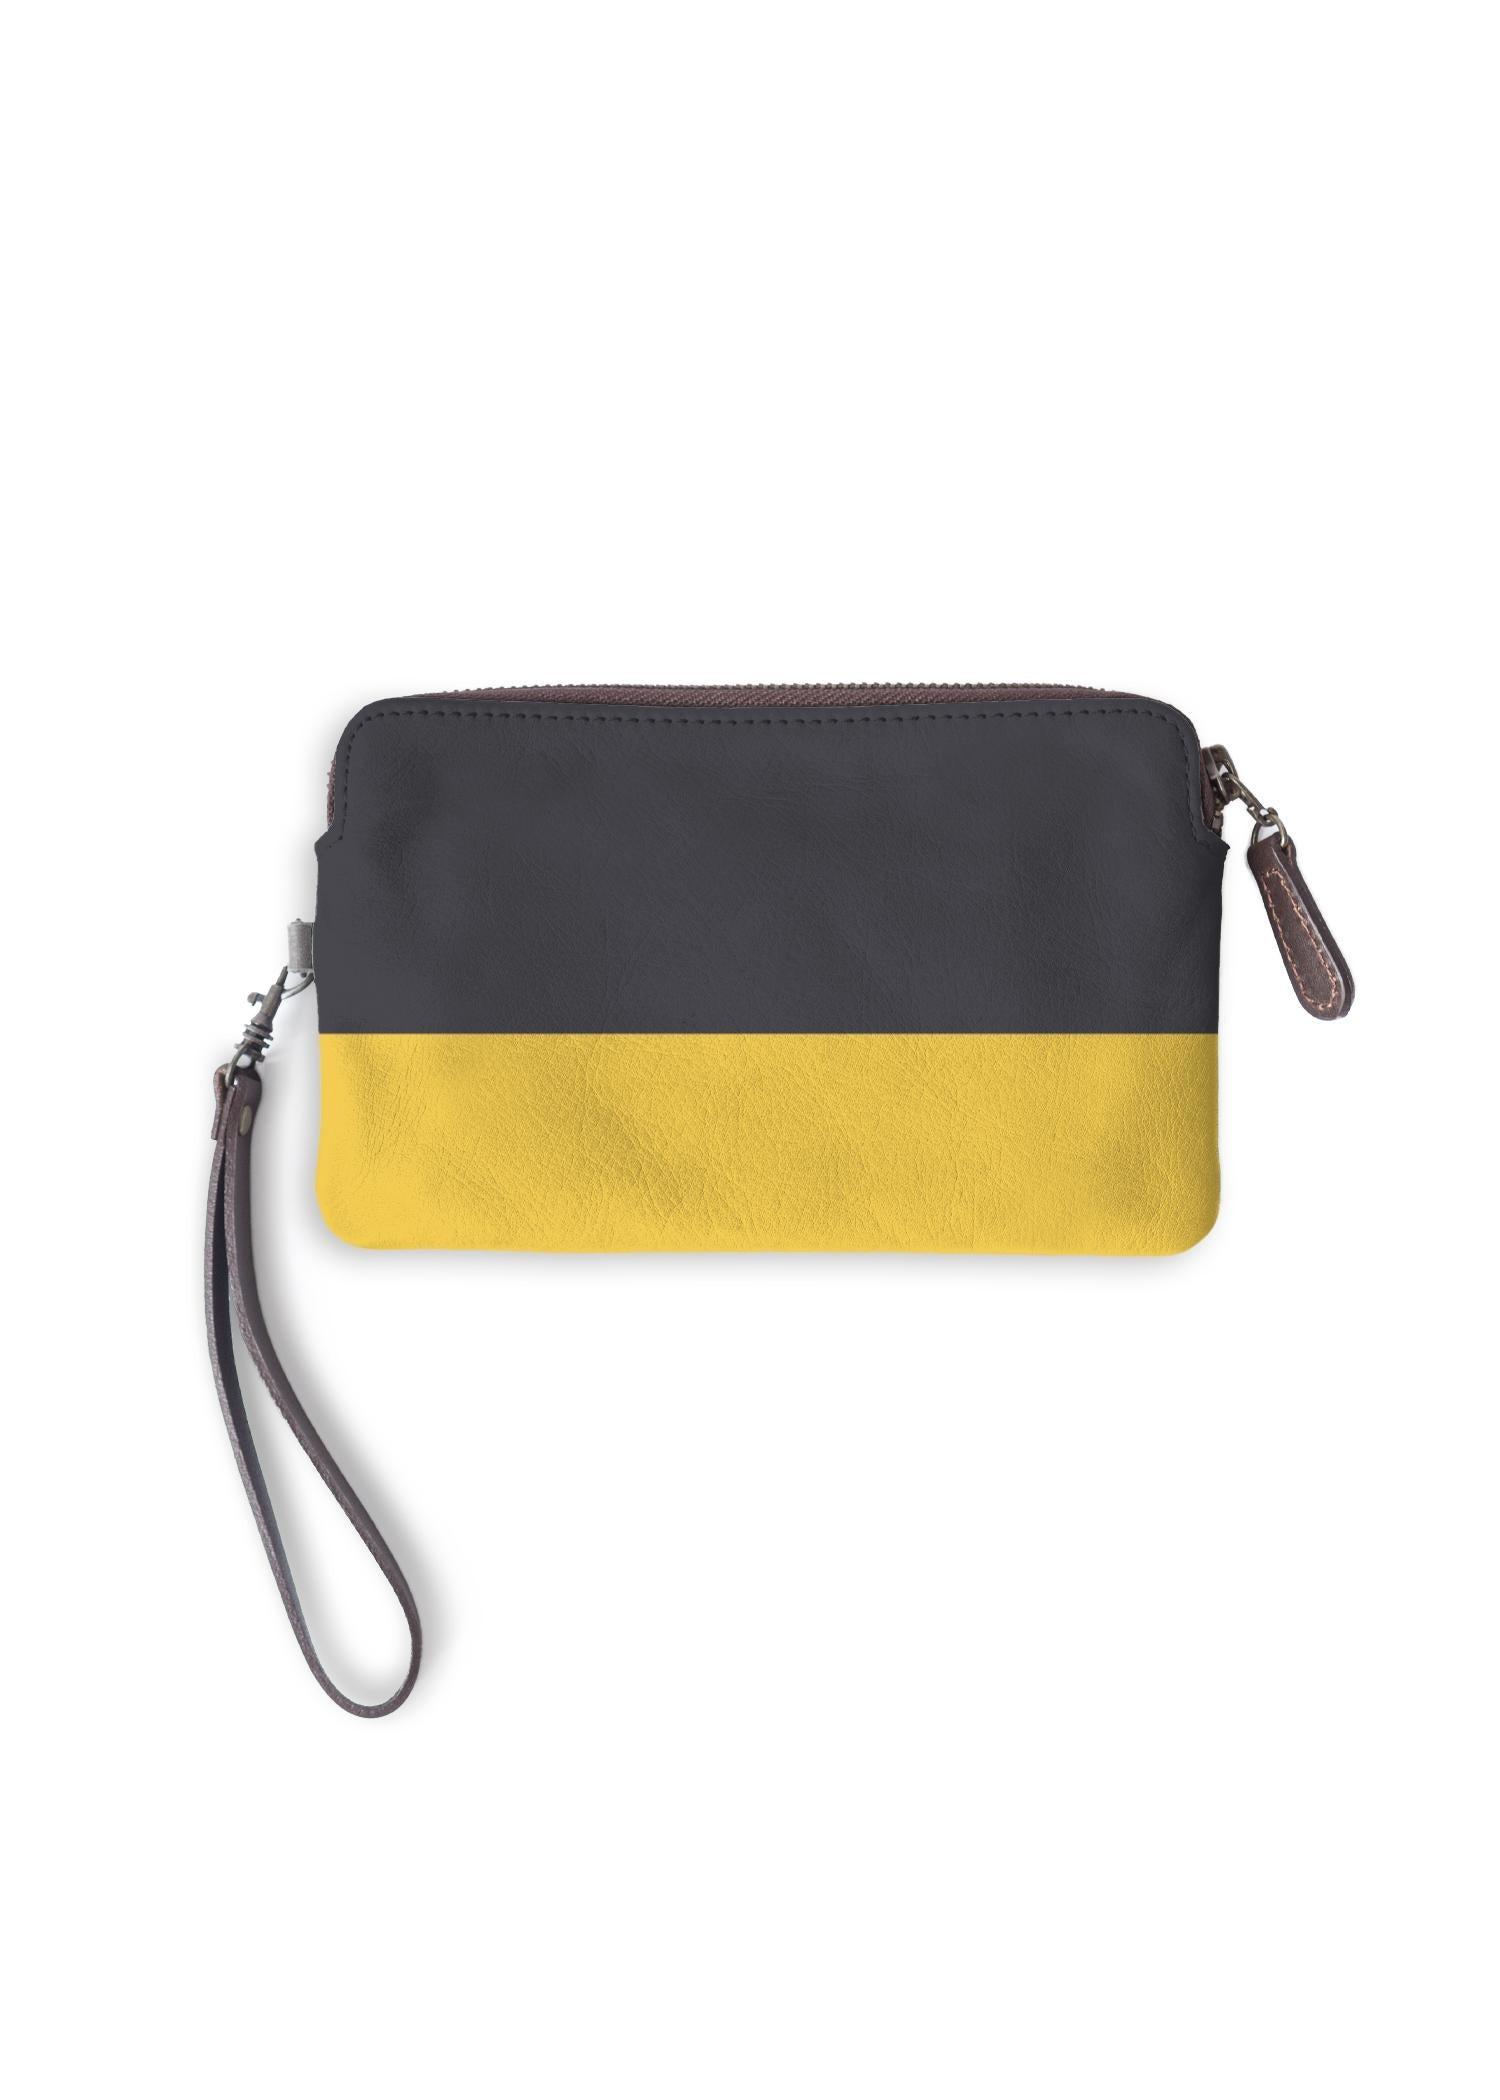 VIDA Leather Statement Clutch - Blue Yellow Fashion by VIDA Original Artist  - Size: One Size